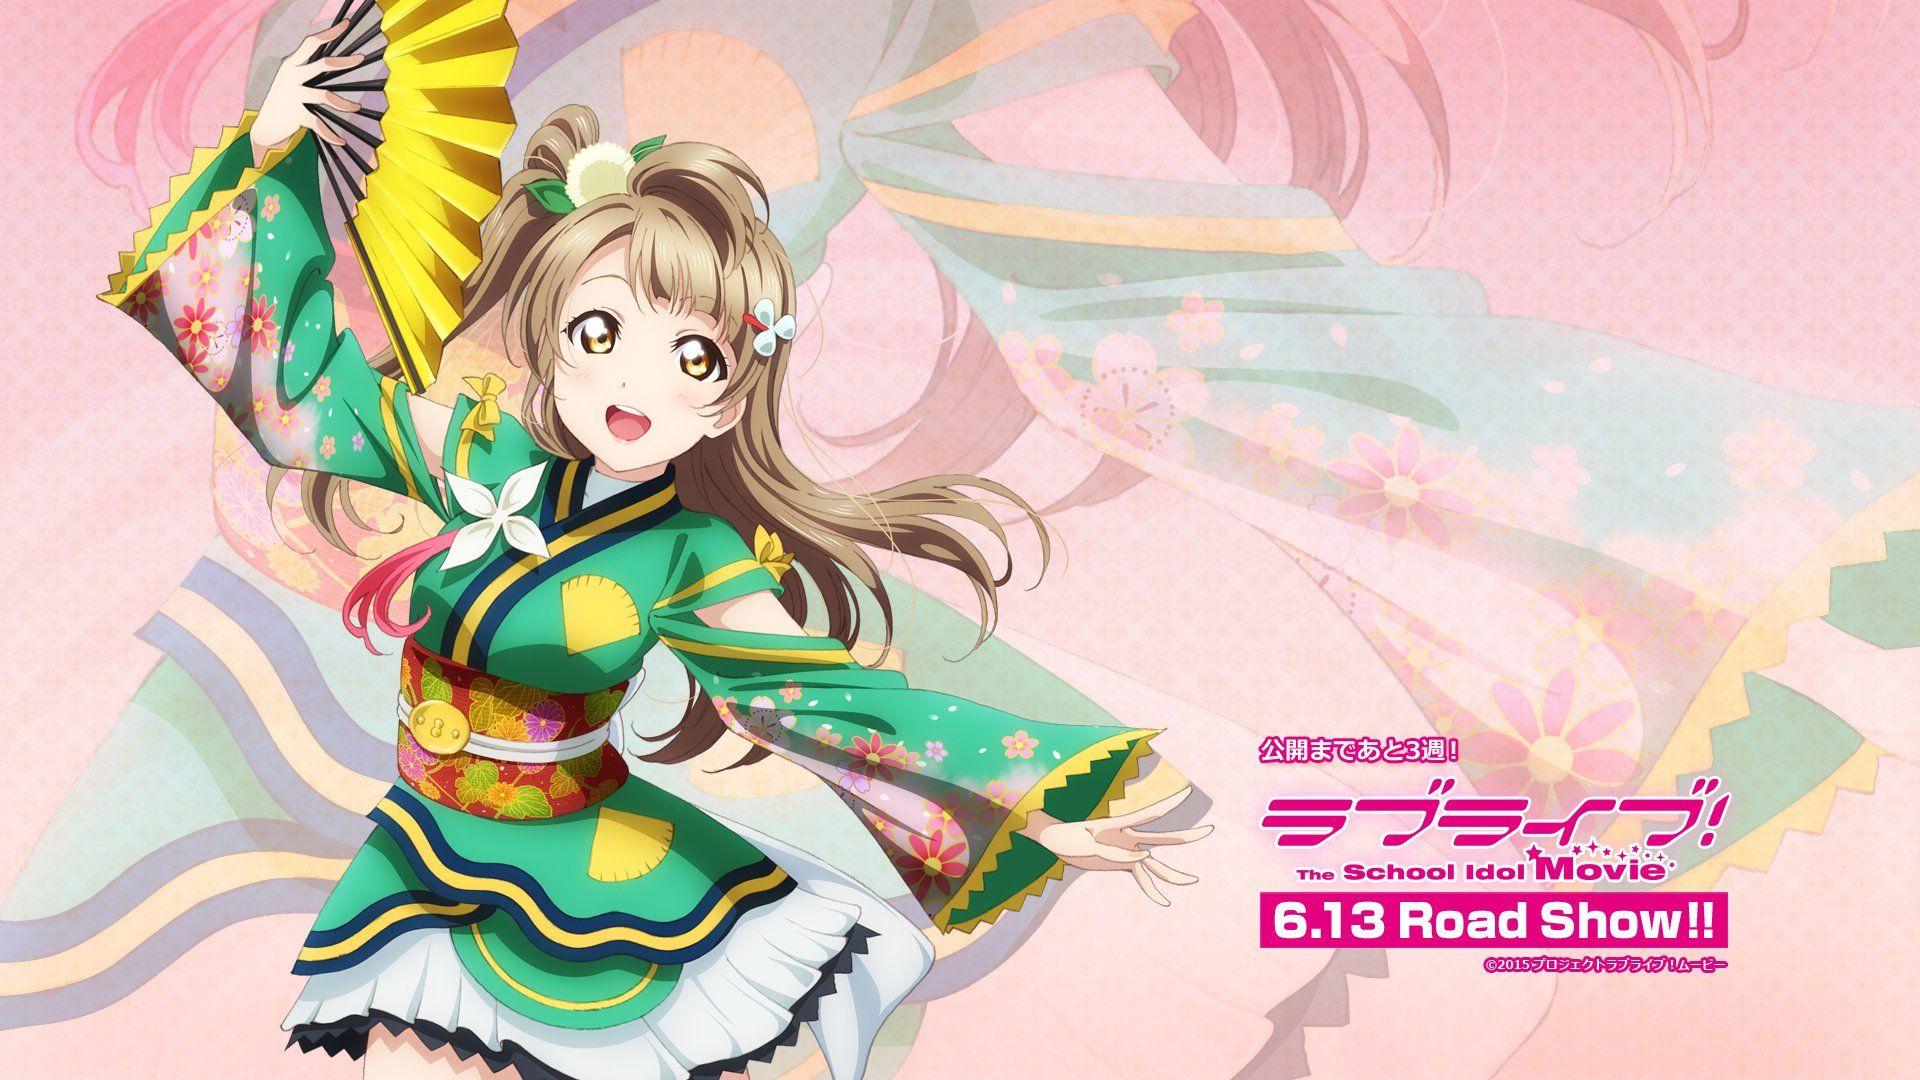 Anime Love Live Kotori Minami Wallpaper Anime 1920x1080